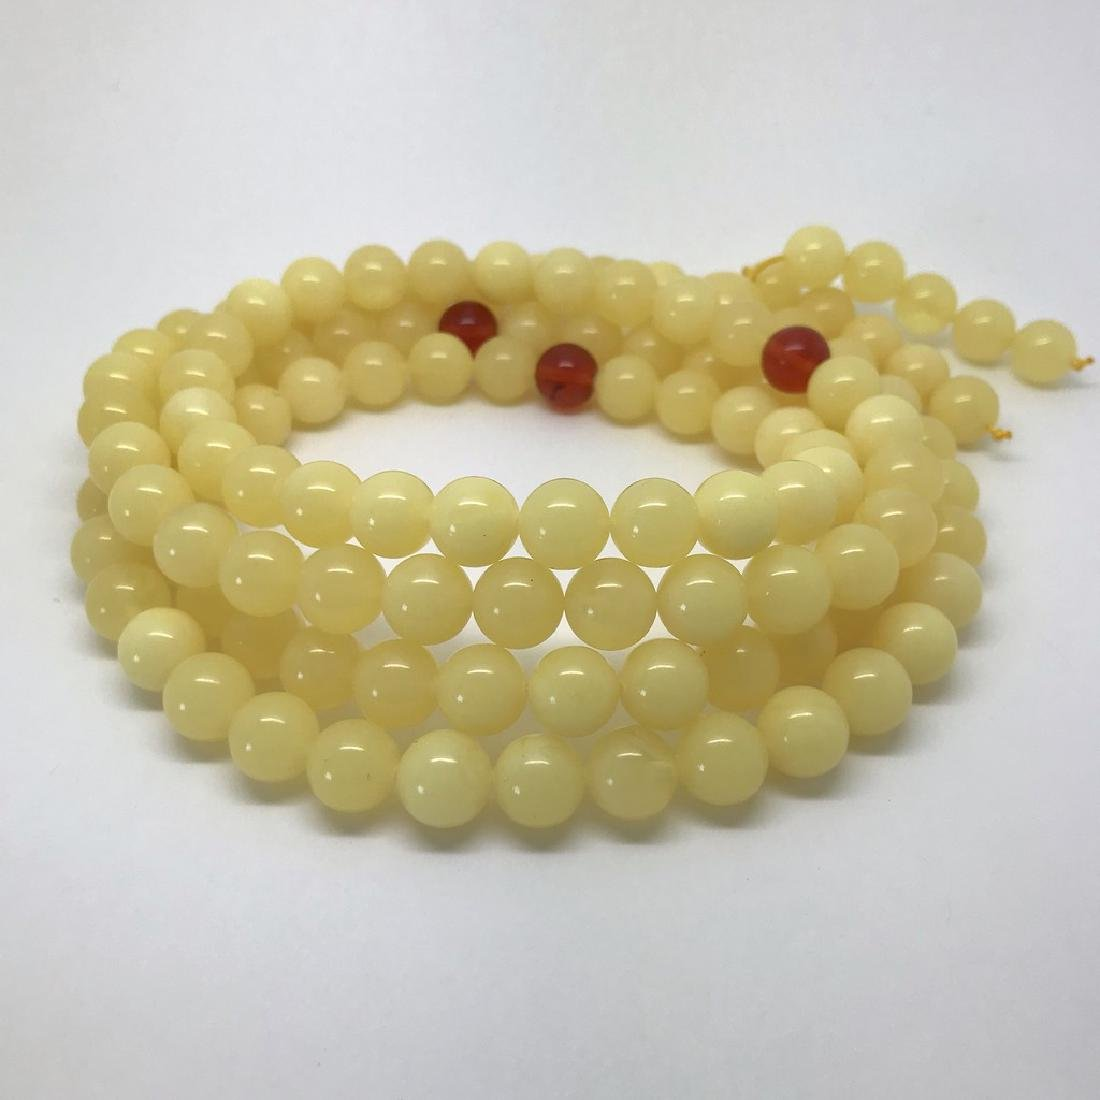 Tibetan japa mala Baltic amber white 108 beads ø10mm 75 - 7